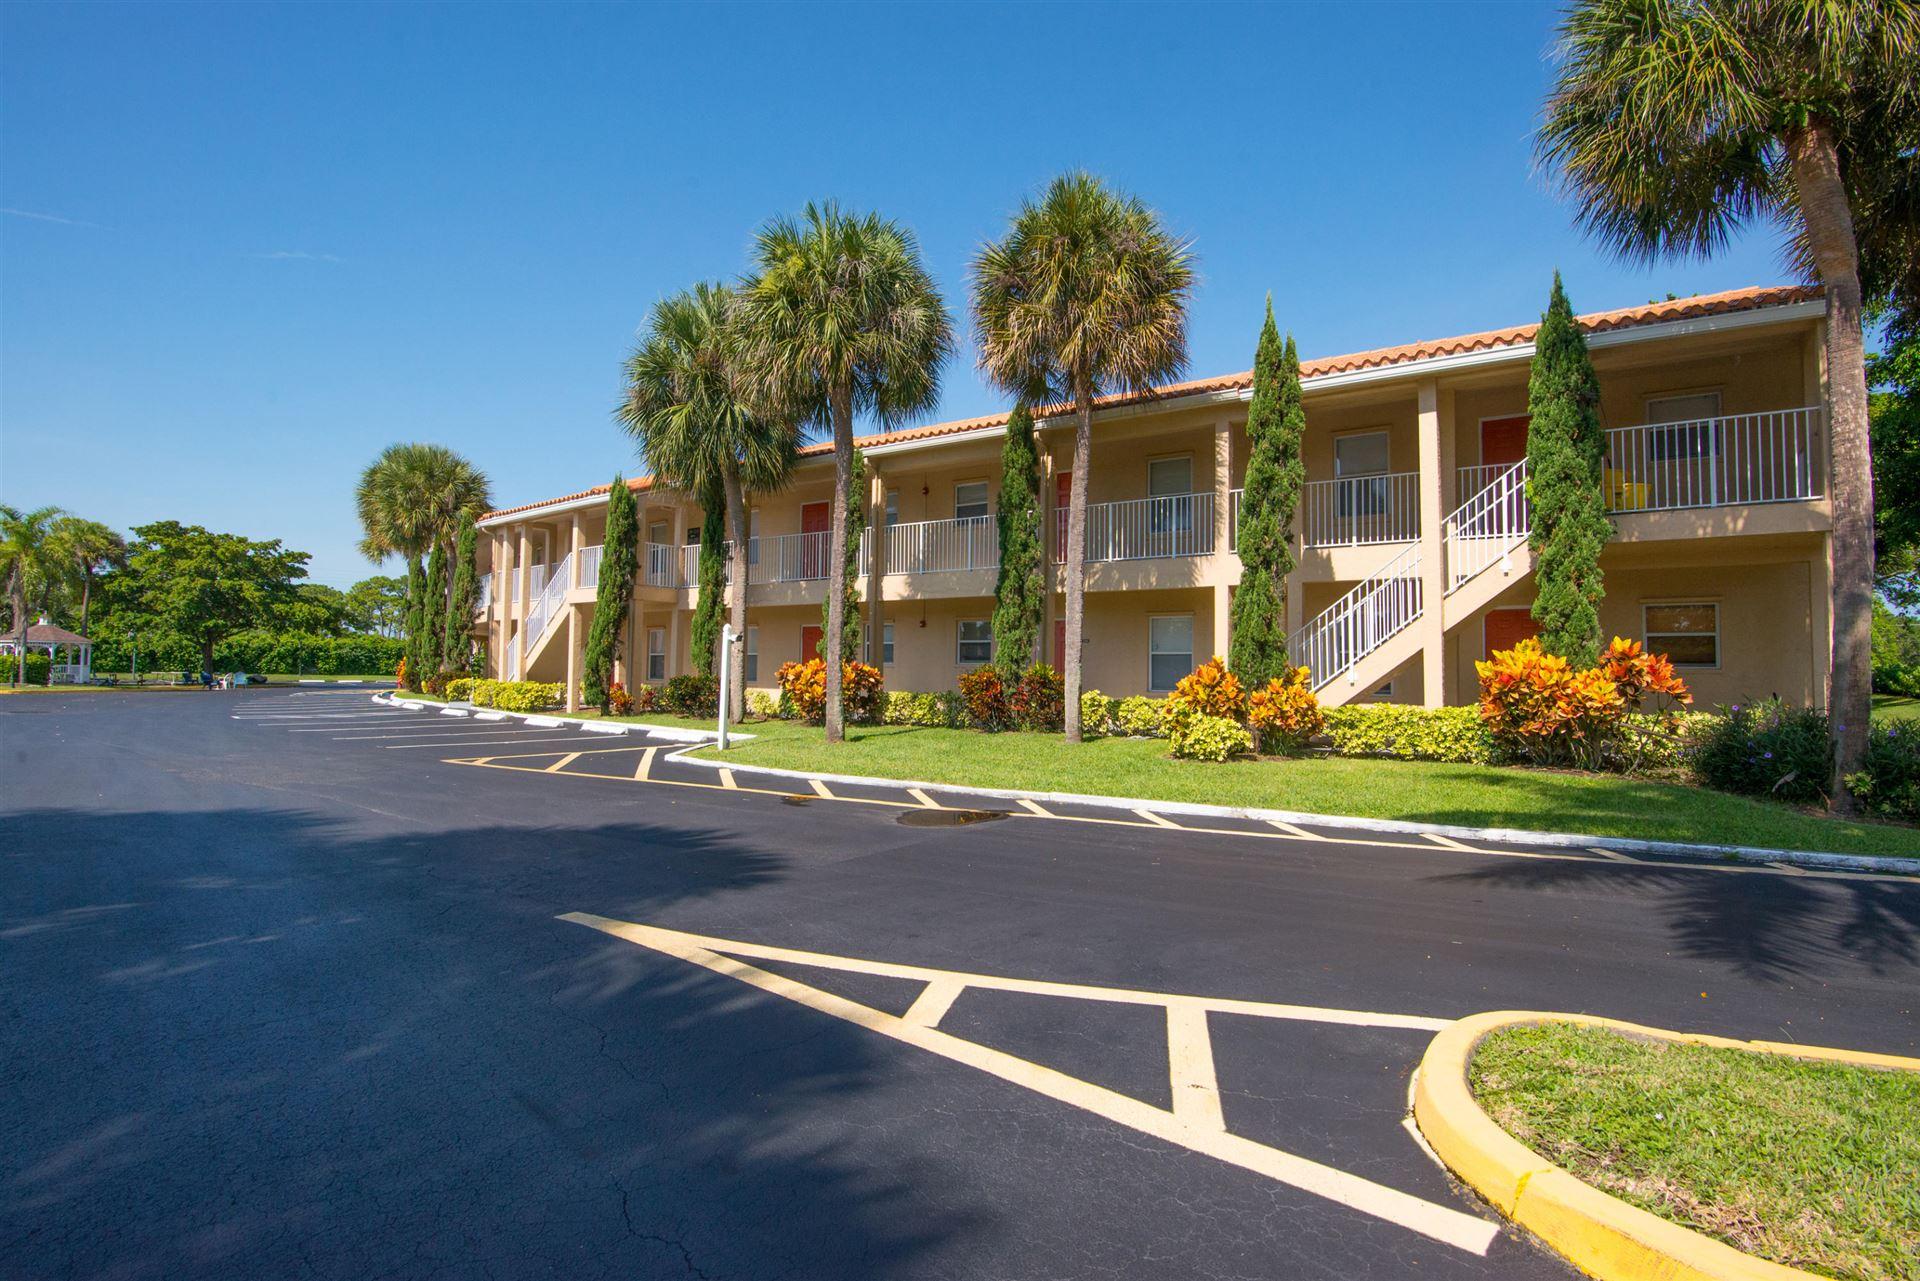 5458 Via Delray Boulevard, Delray Beach, FL 33484 - #: RX-10642813